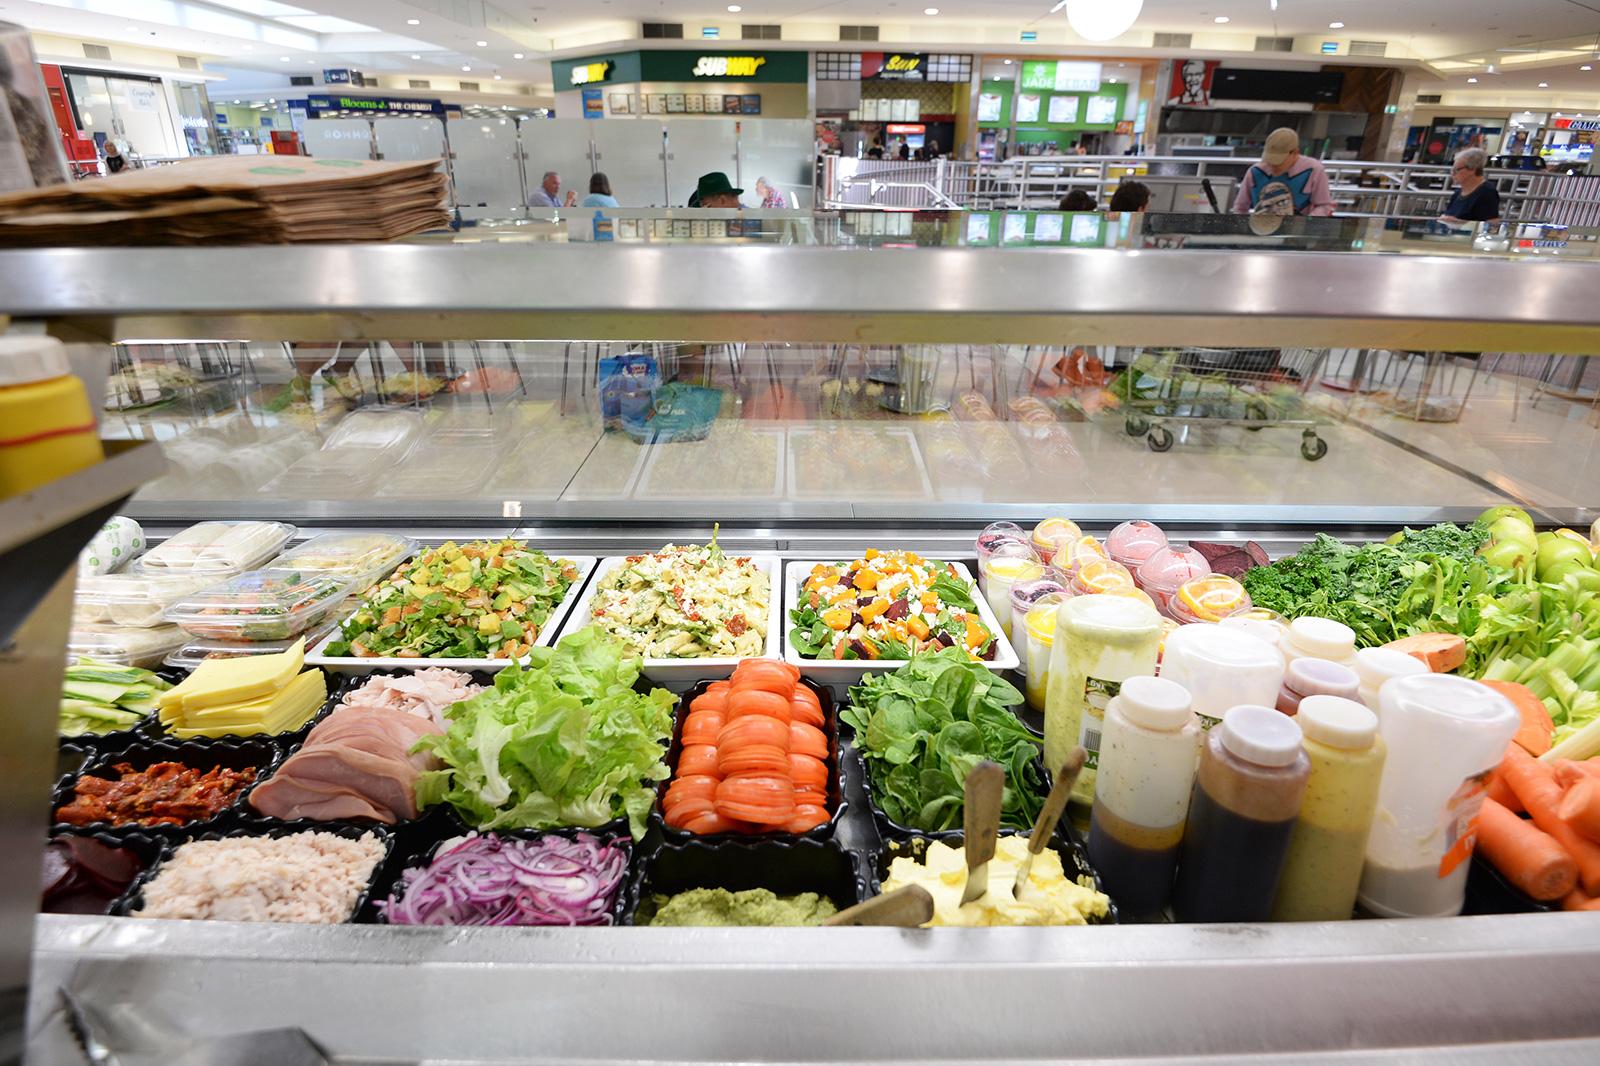 take-a-way-sandwich-shop-healthy-habits-grafton-shopping-world-reduced-price-2